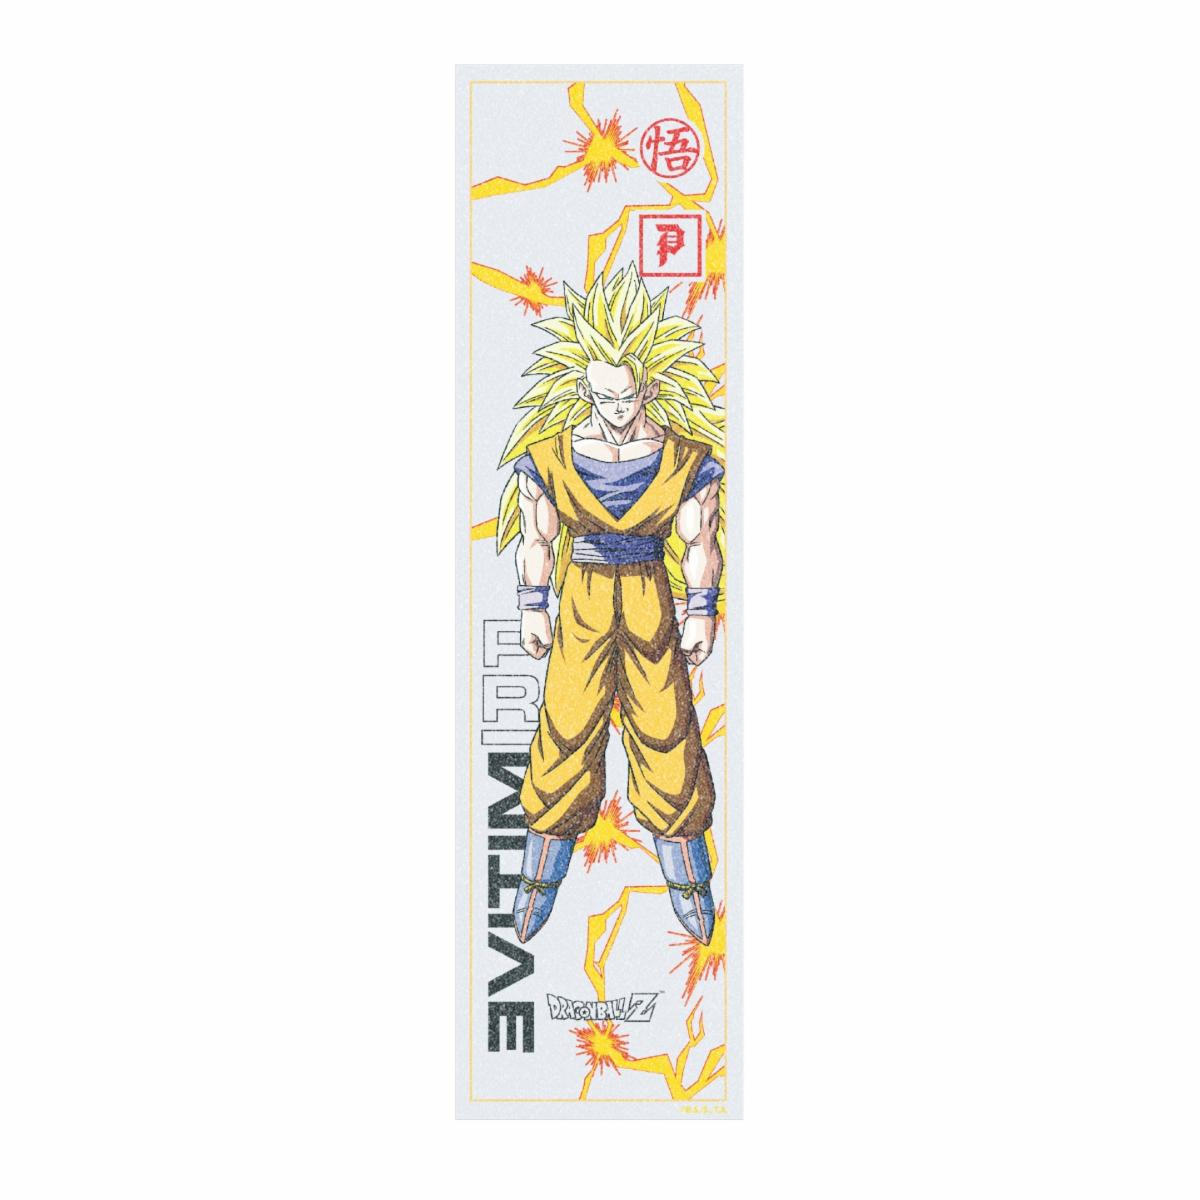 Details about Primitive Dragon Ball Z Goku Glow Skateboard Griptape 9